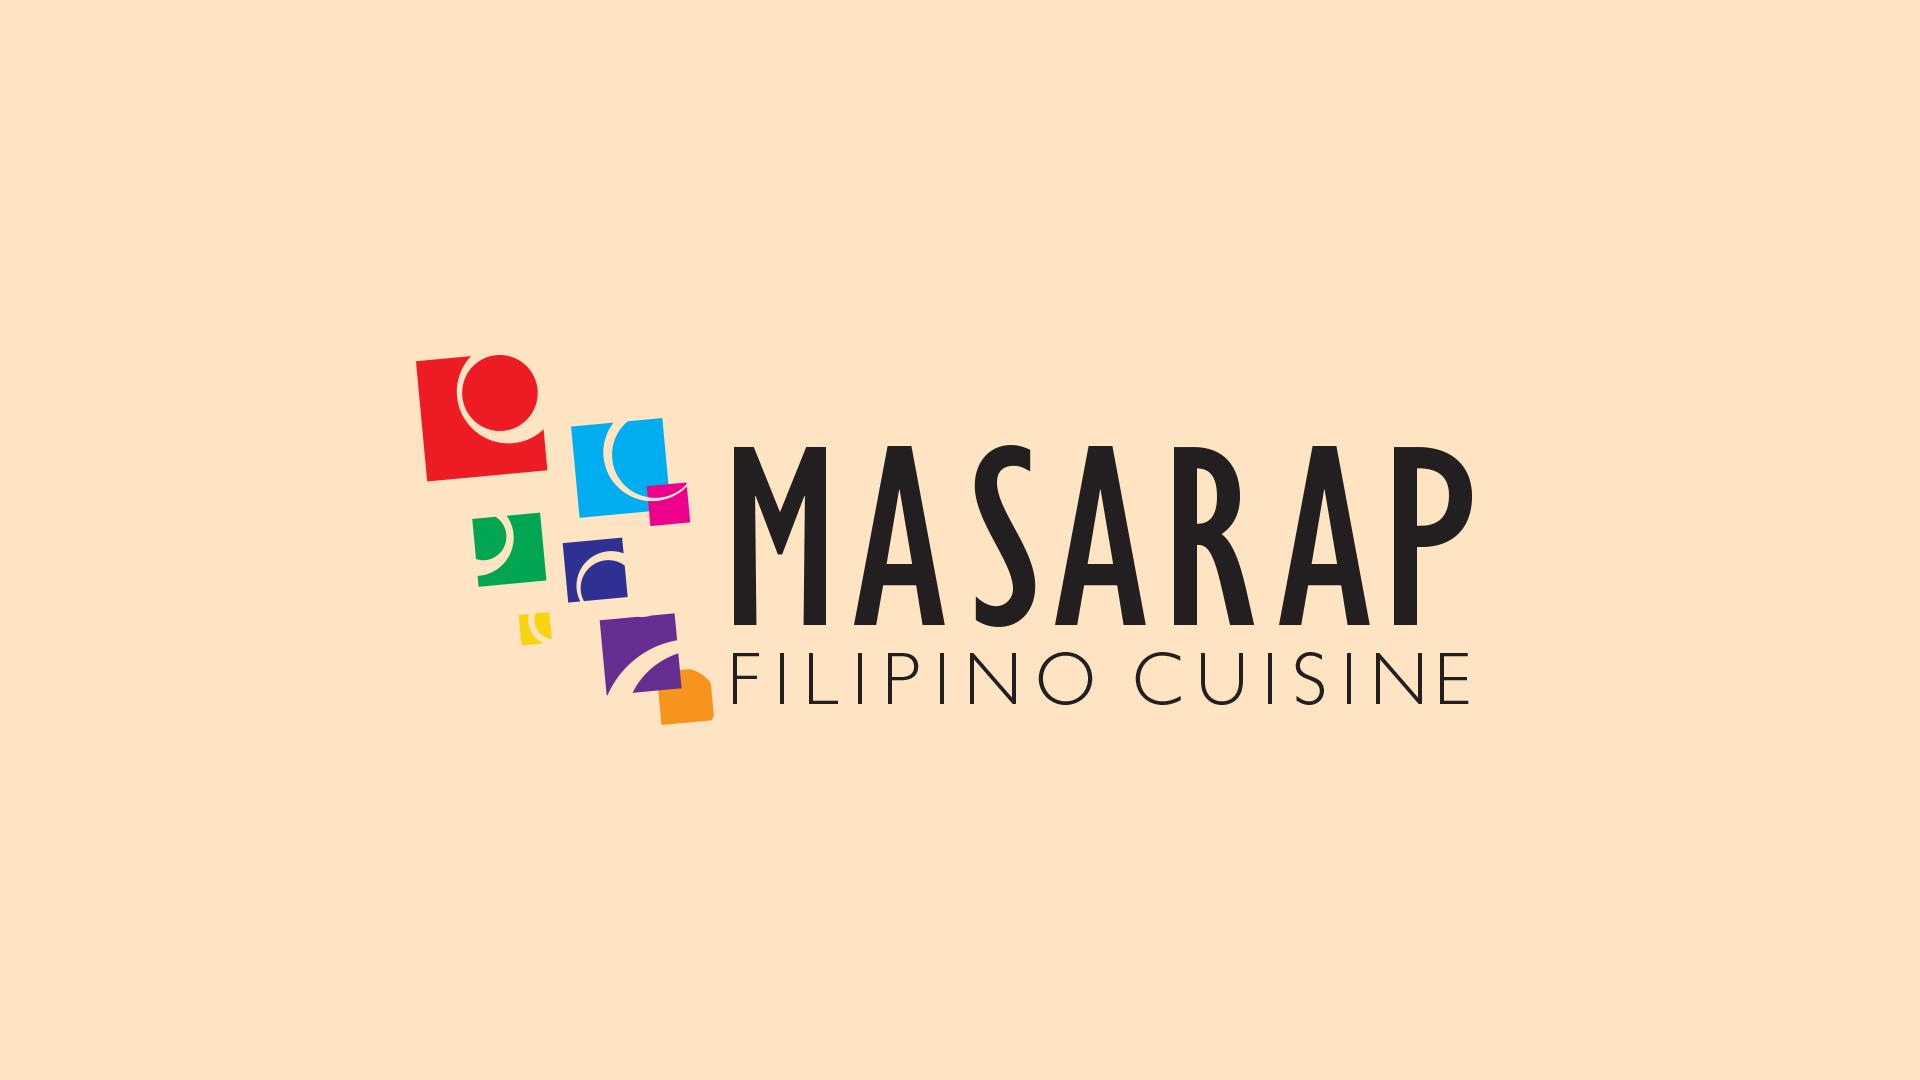 port_masarap_logo.jpg